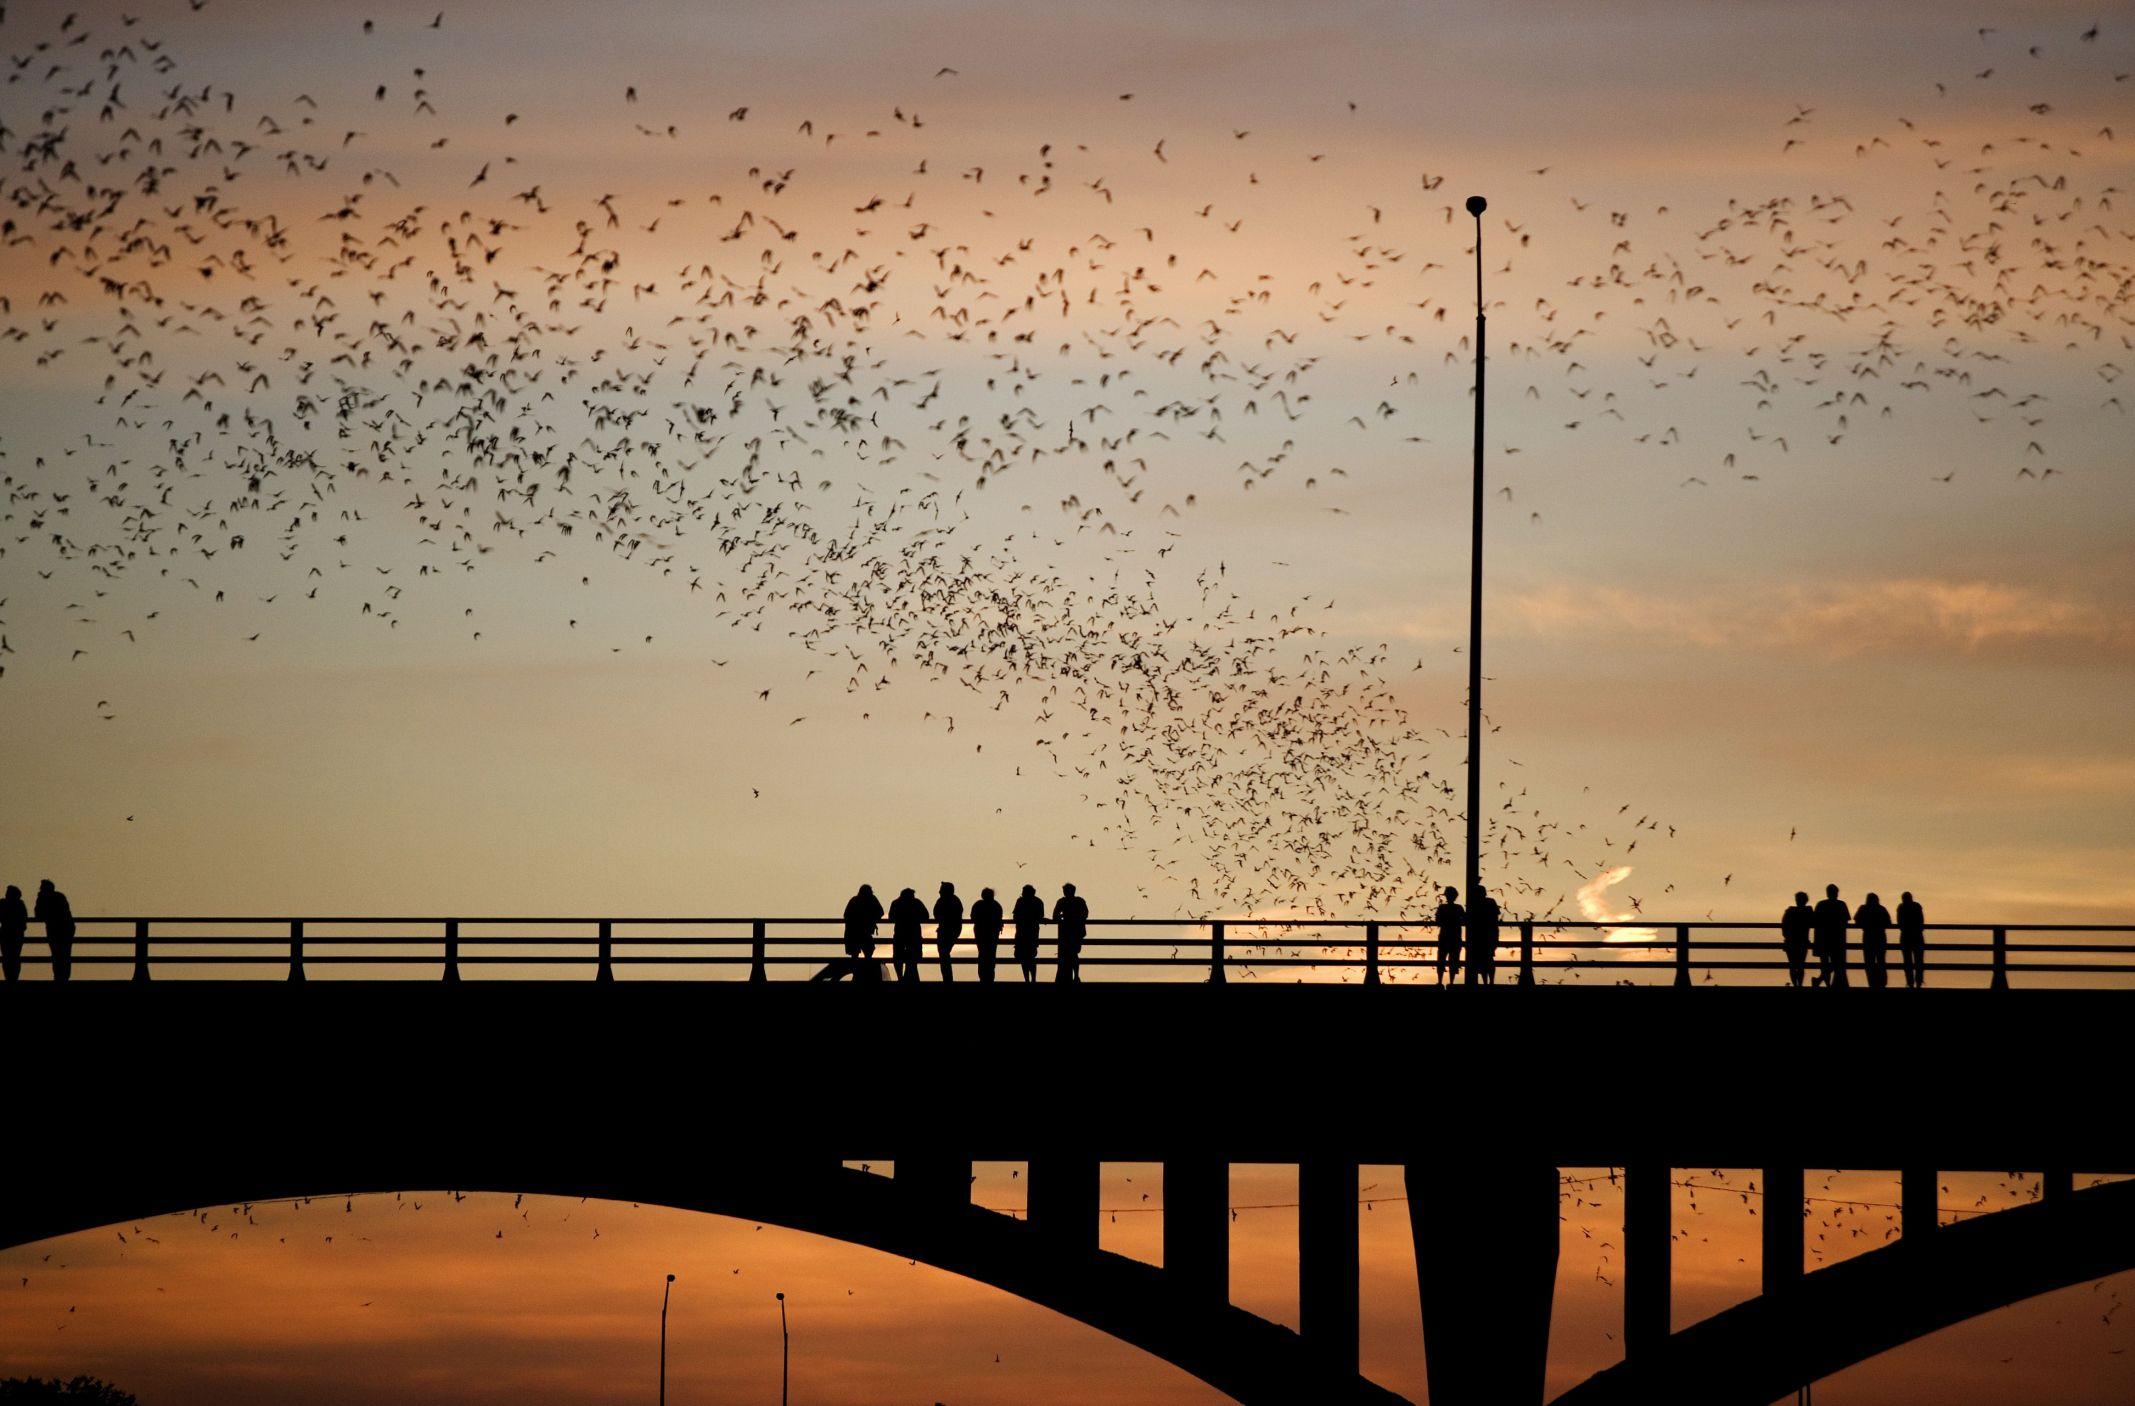 How To See Austin Bats At The Congress Avenue Bridge